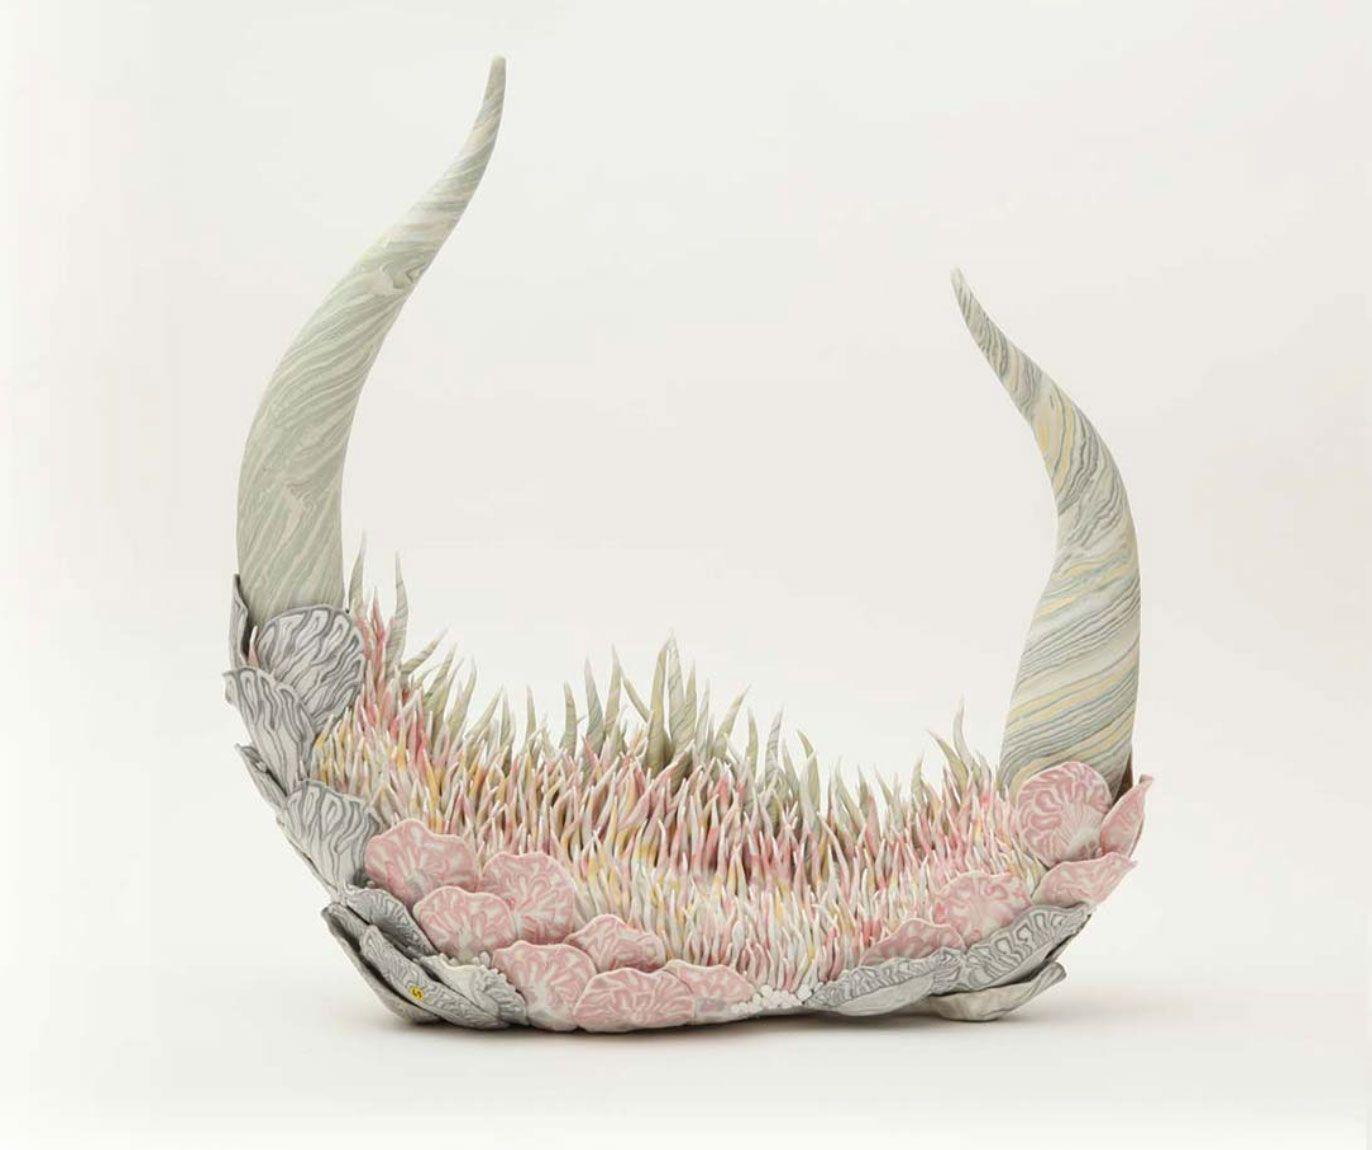 Konno Tomoko - Organic sculptures